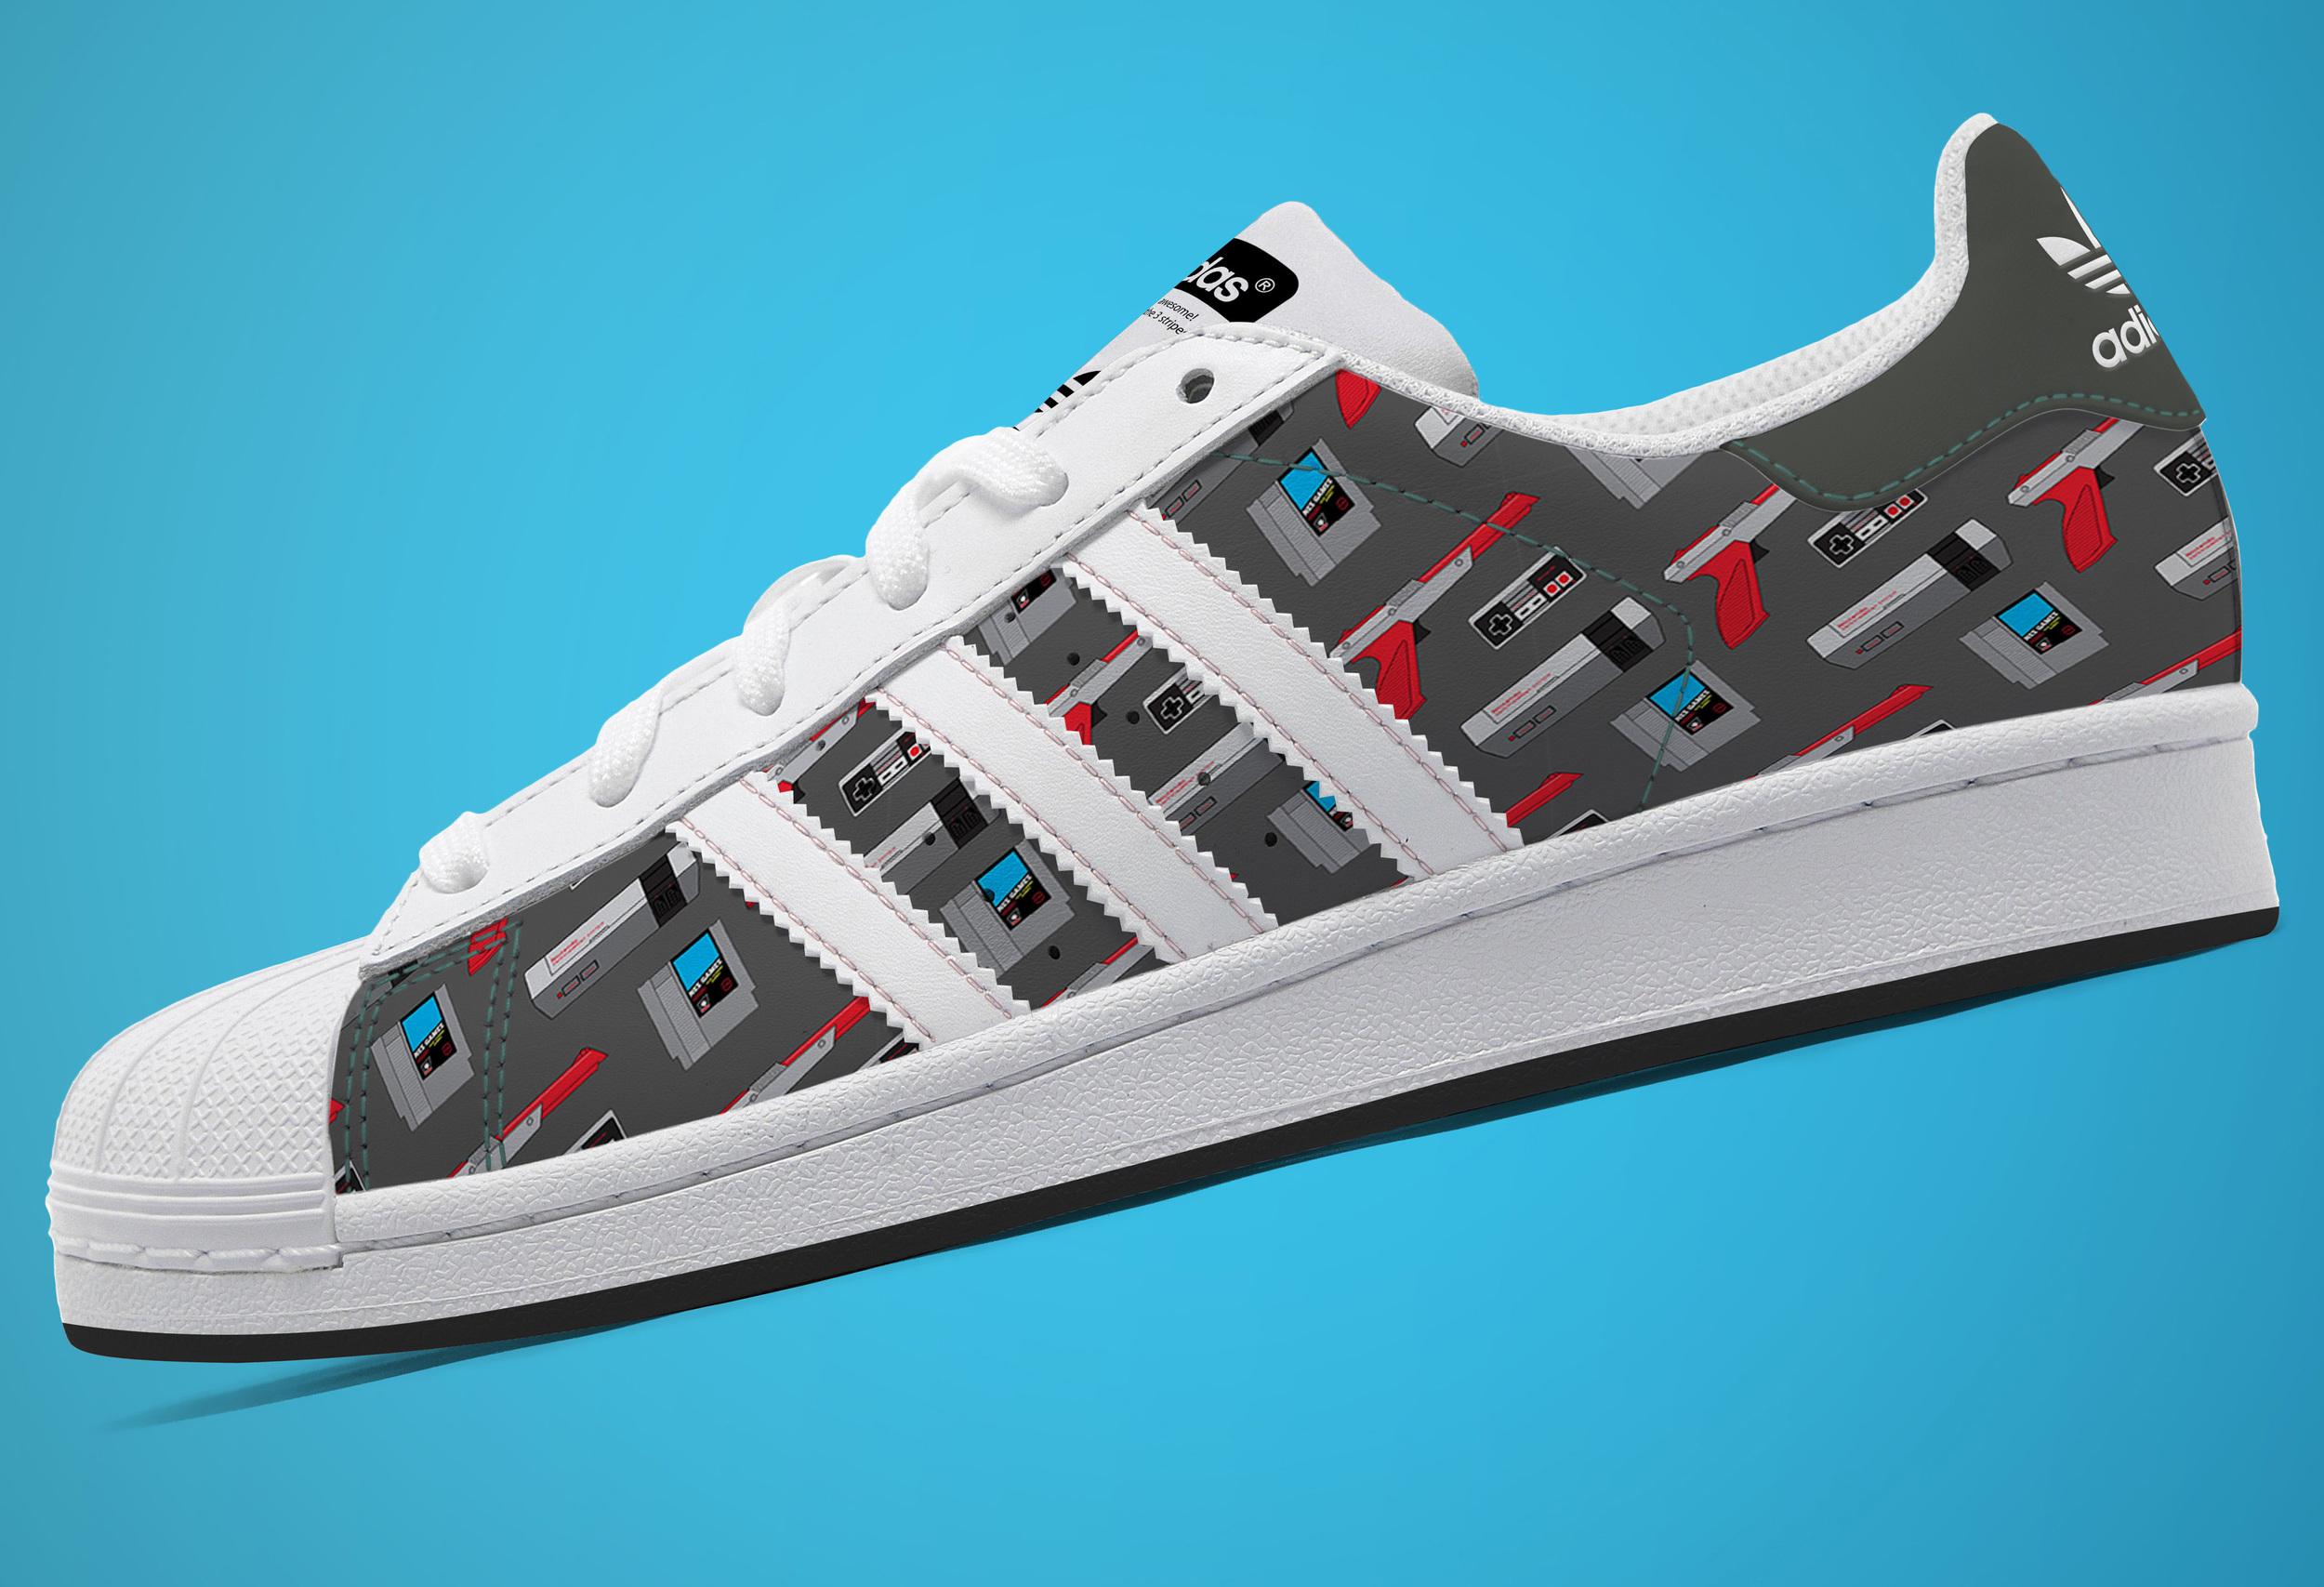 Adidas Nintendo NES Shoe Concept Mockup